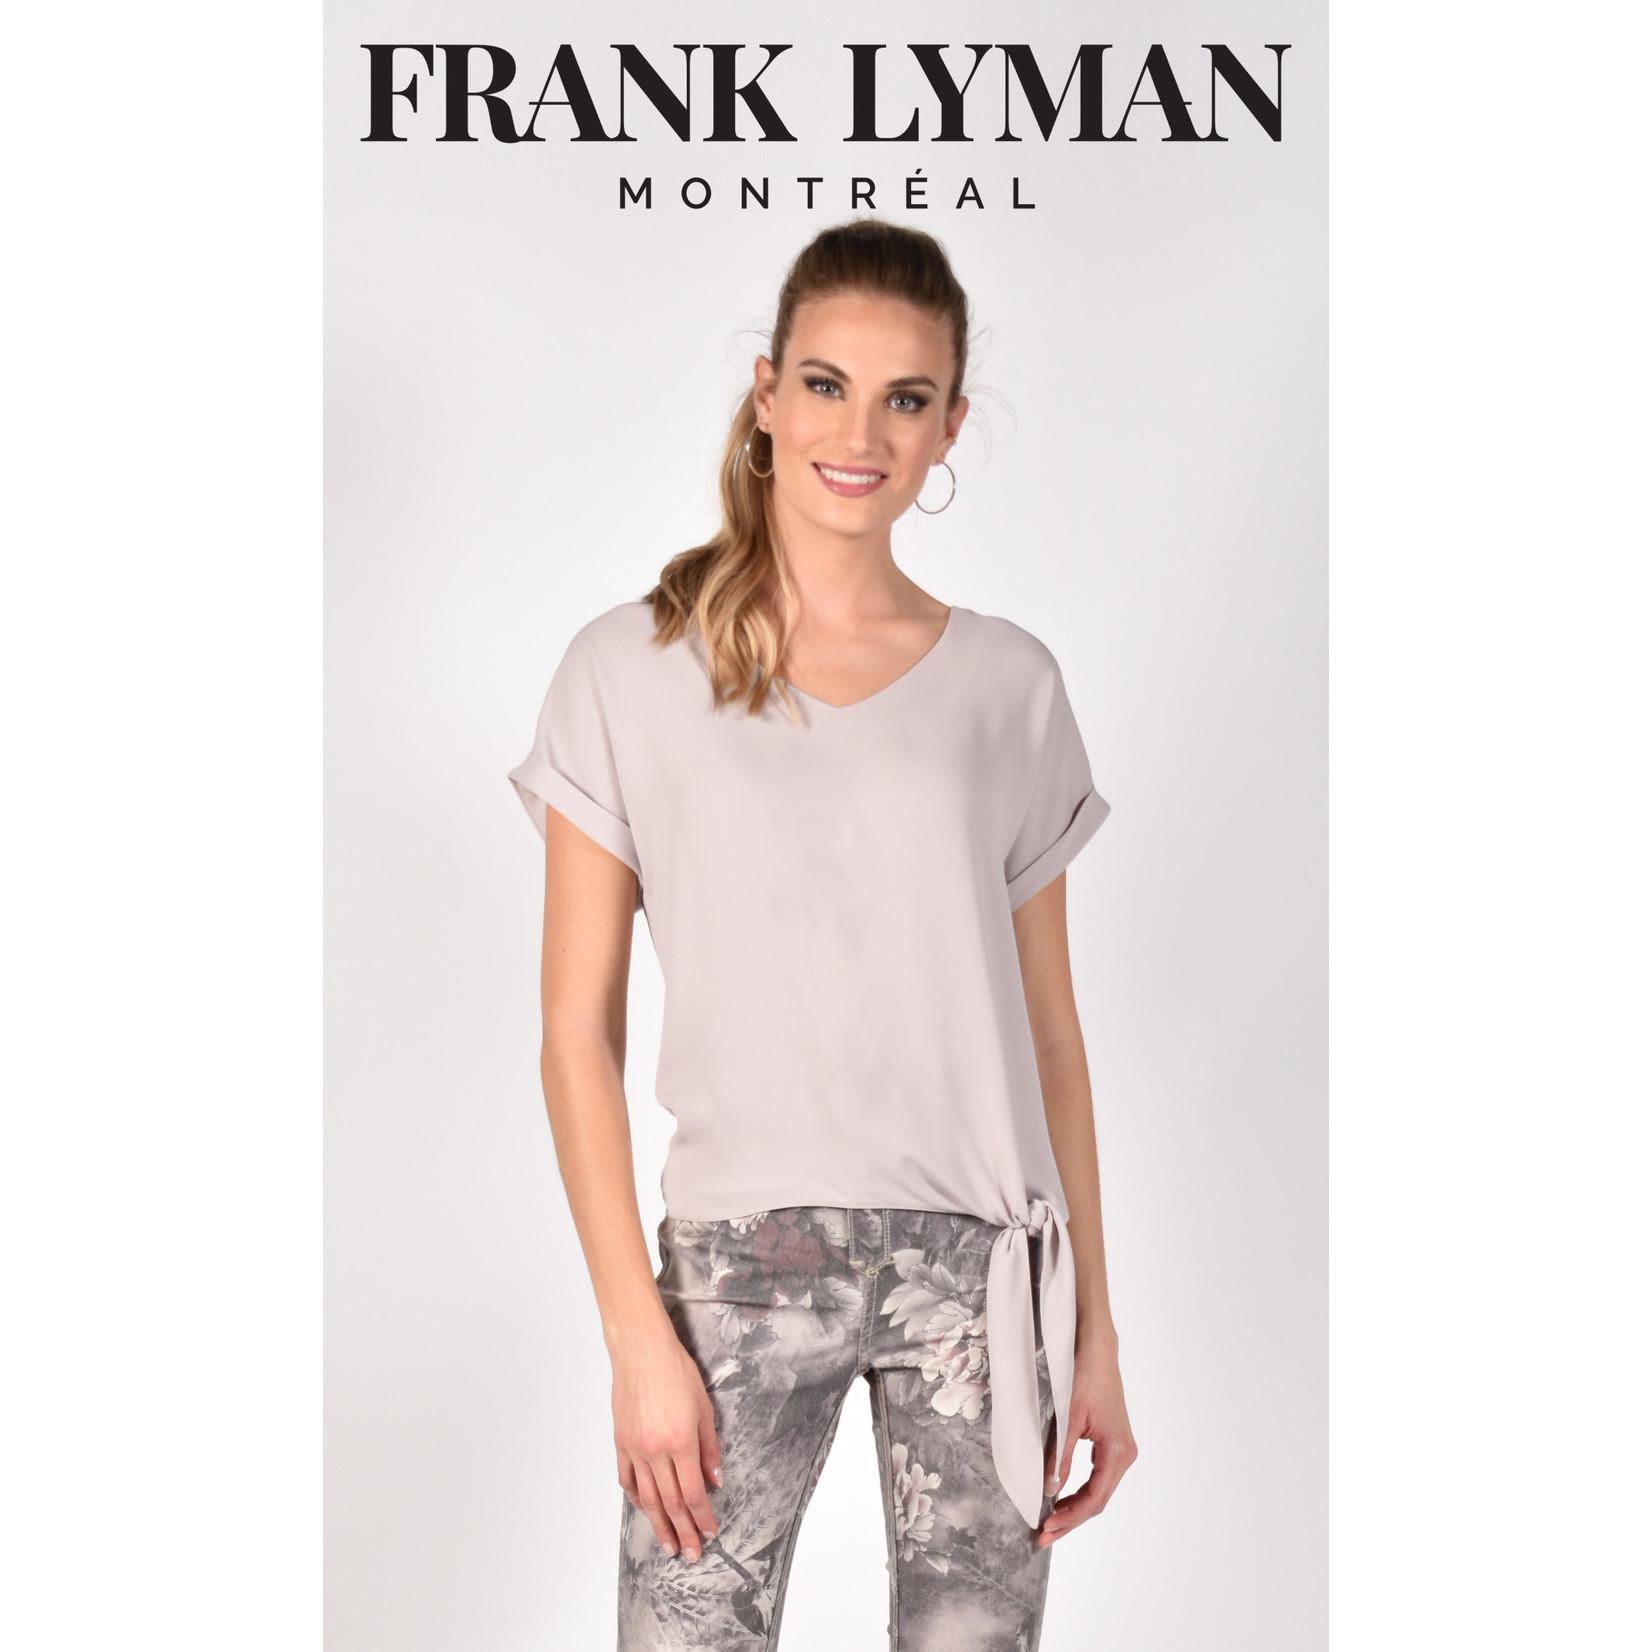 Frank Lyman Stoven Woven Top